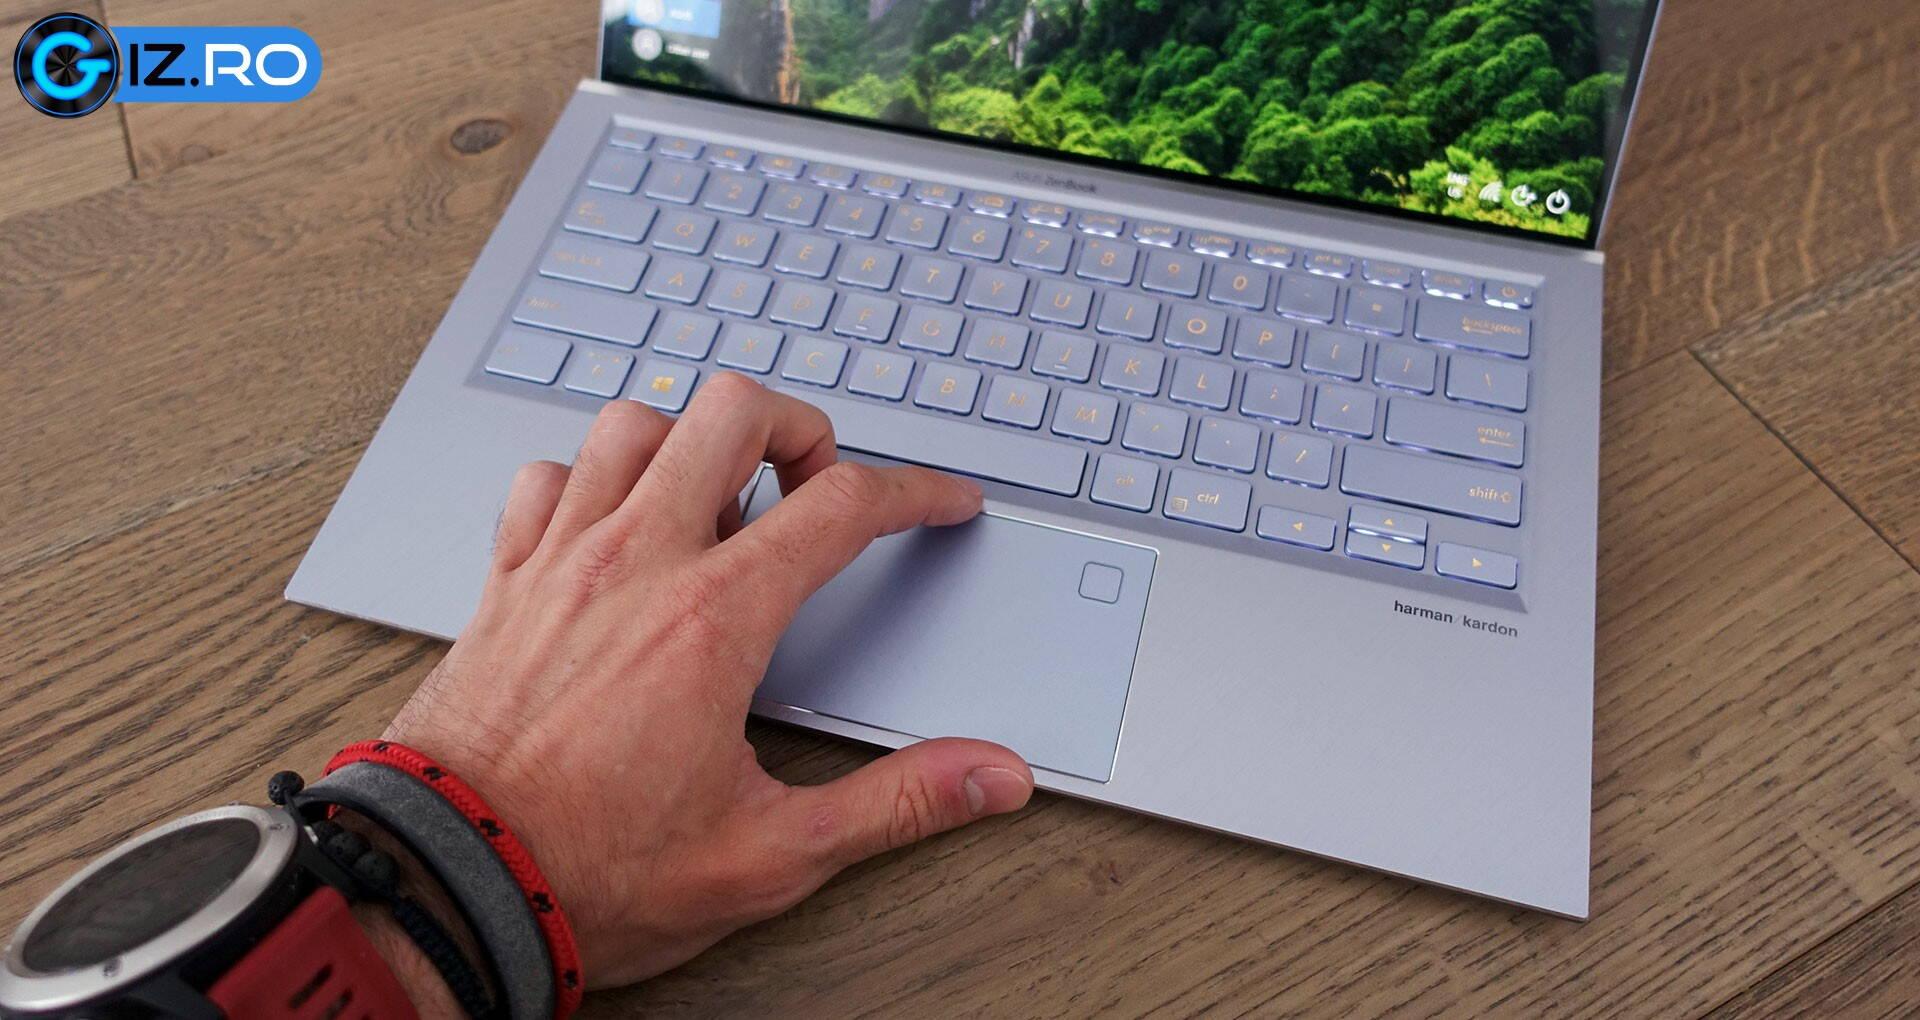 asus-zenbook-s13-ux392-keyboard-clickpad2